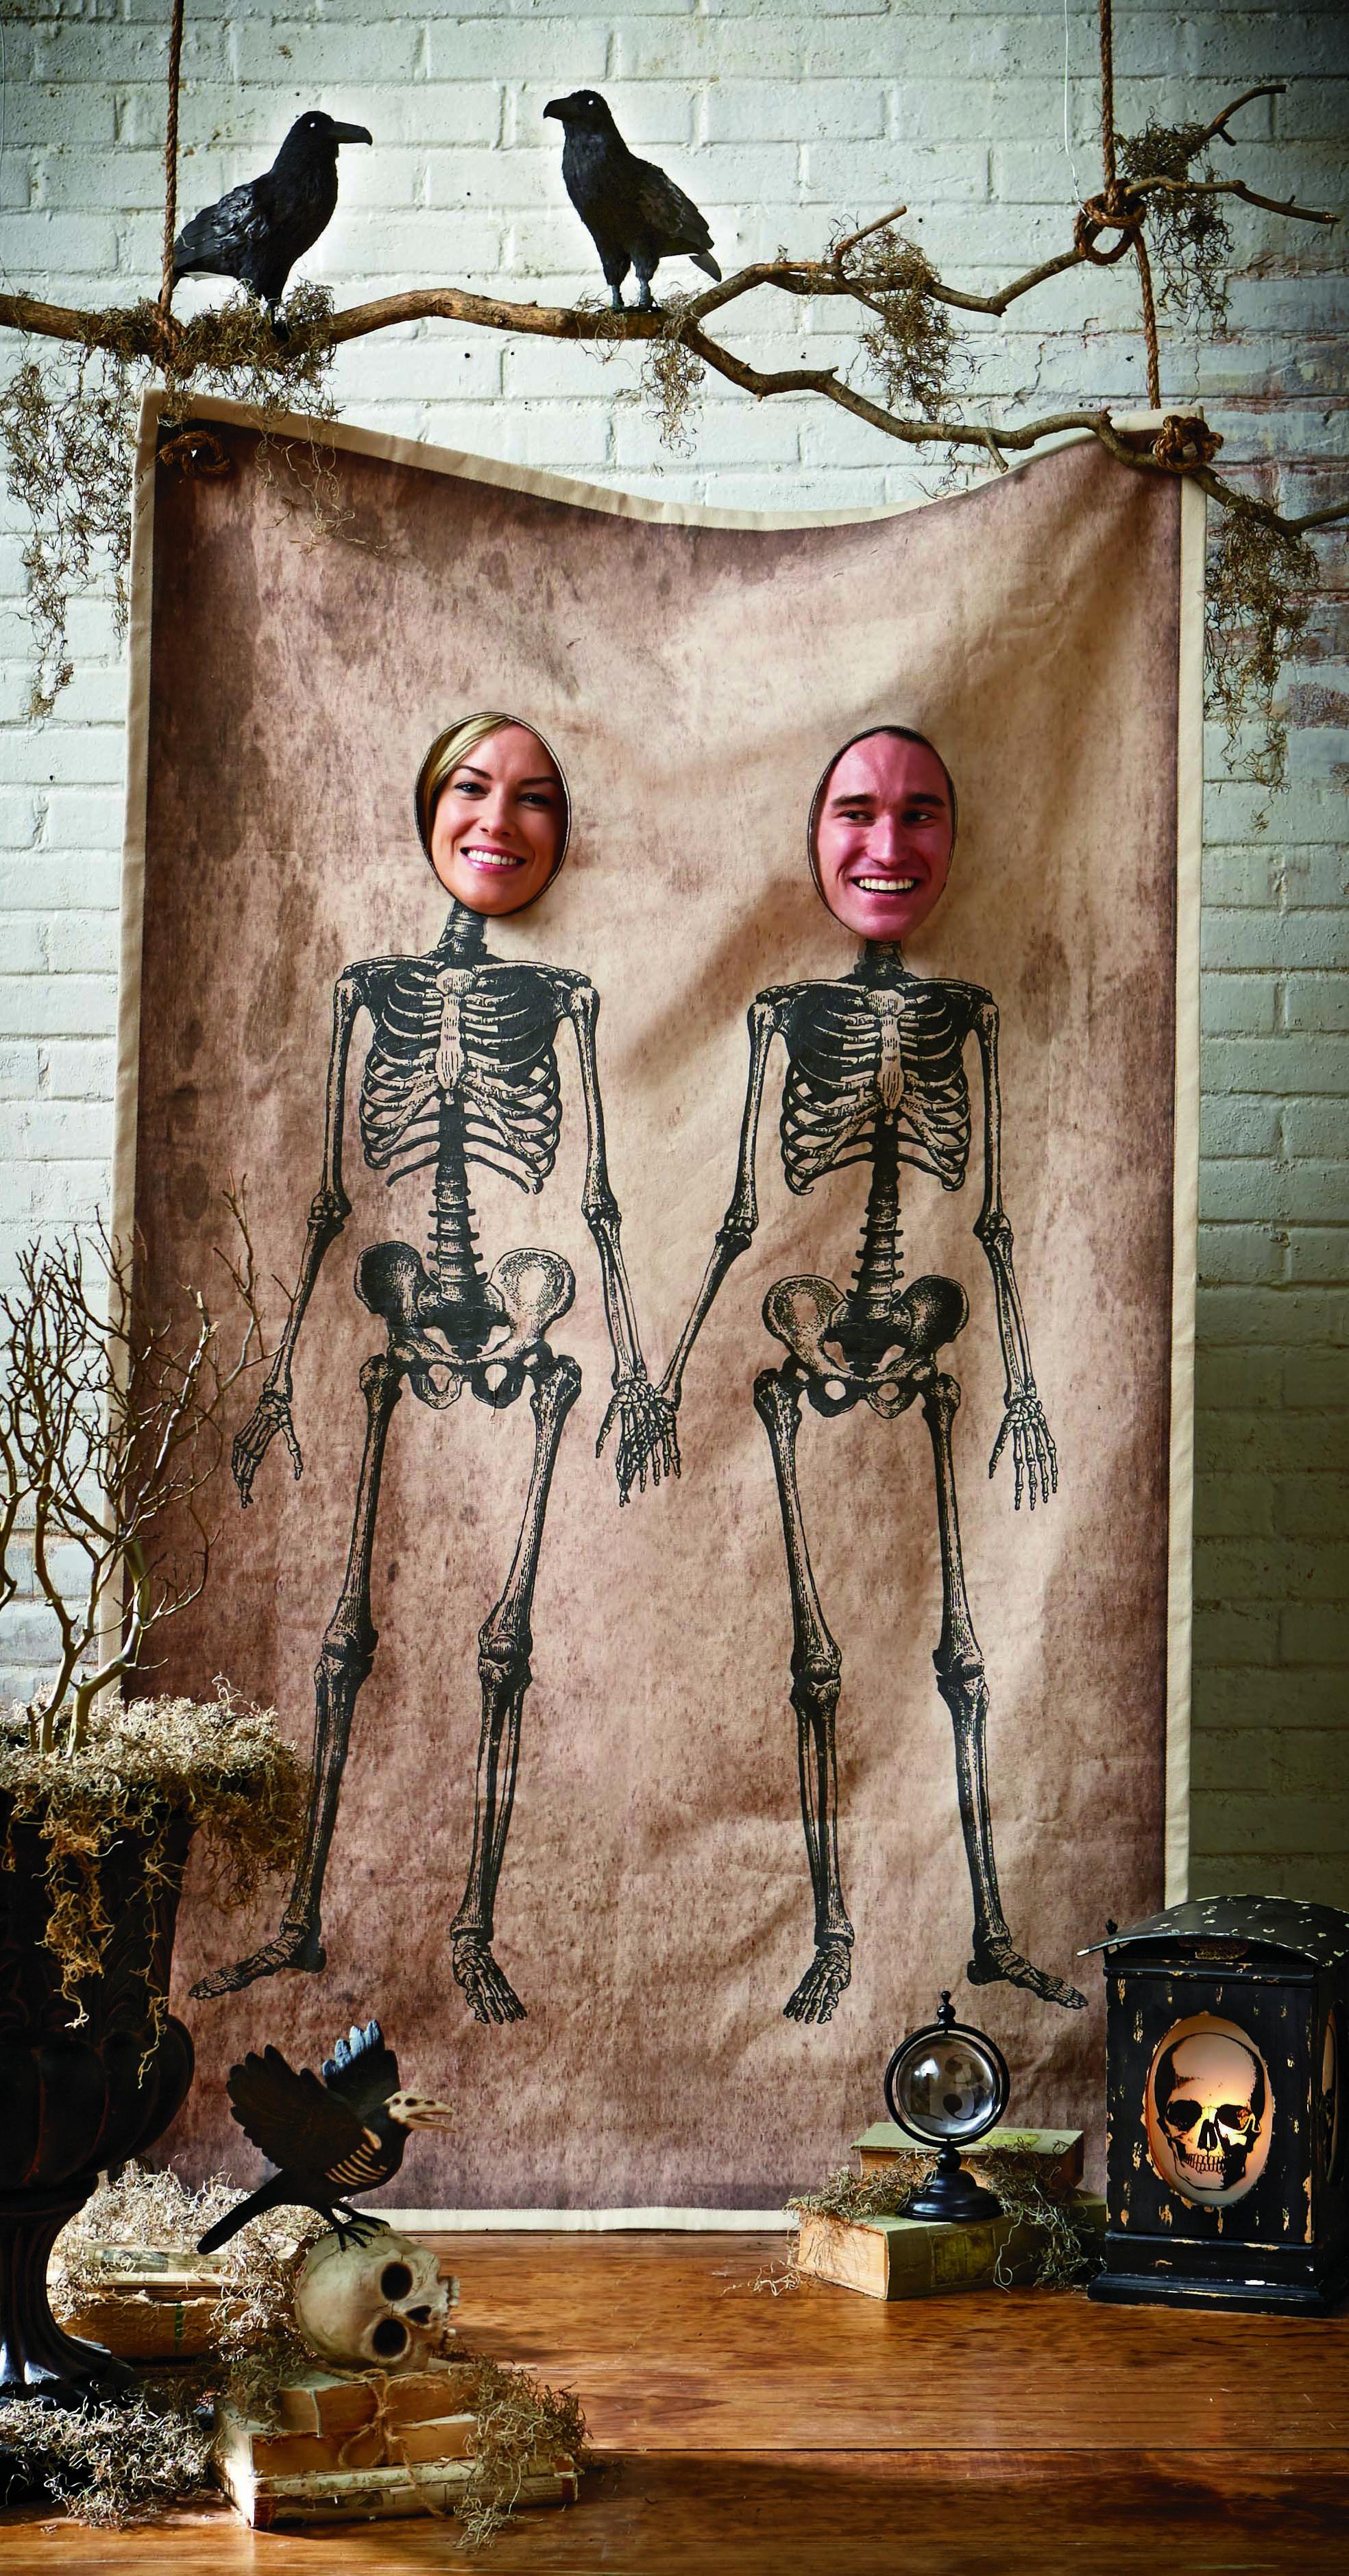 shop martha stewart living halloween dcor at home decorators collection - Martha Stewart Halloween Decor